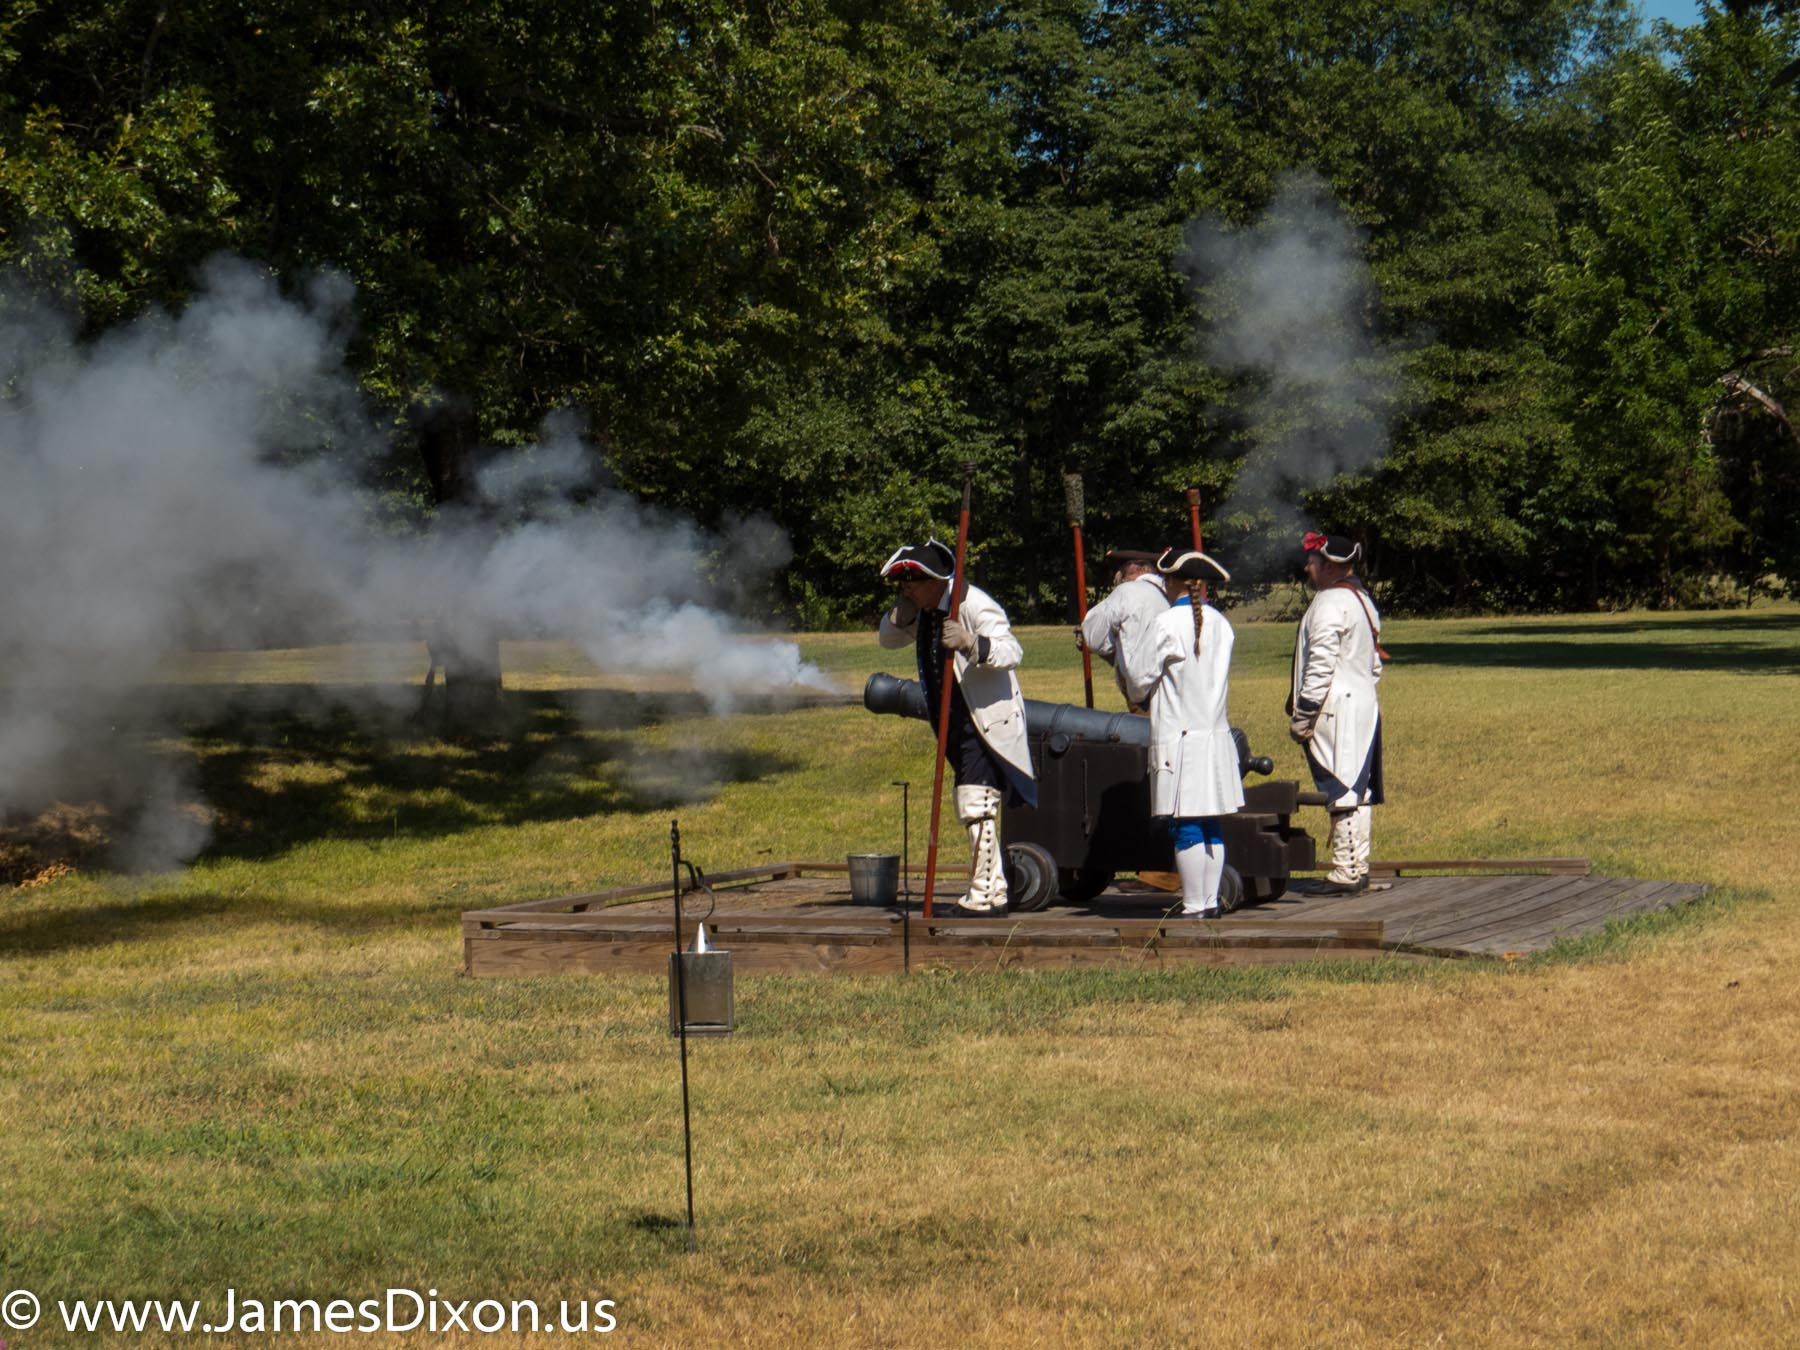 cannon-arkansas-post-national-memorial-july-2013-3084